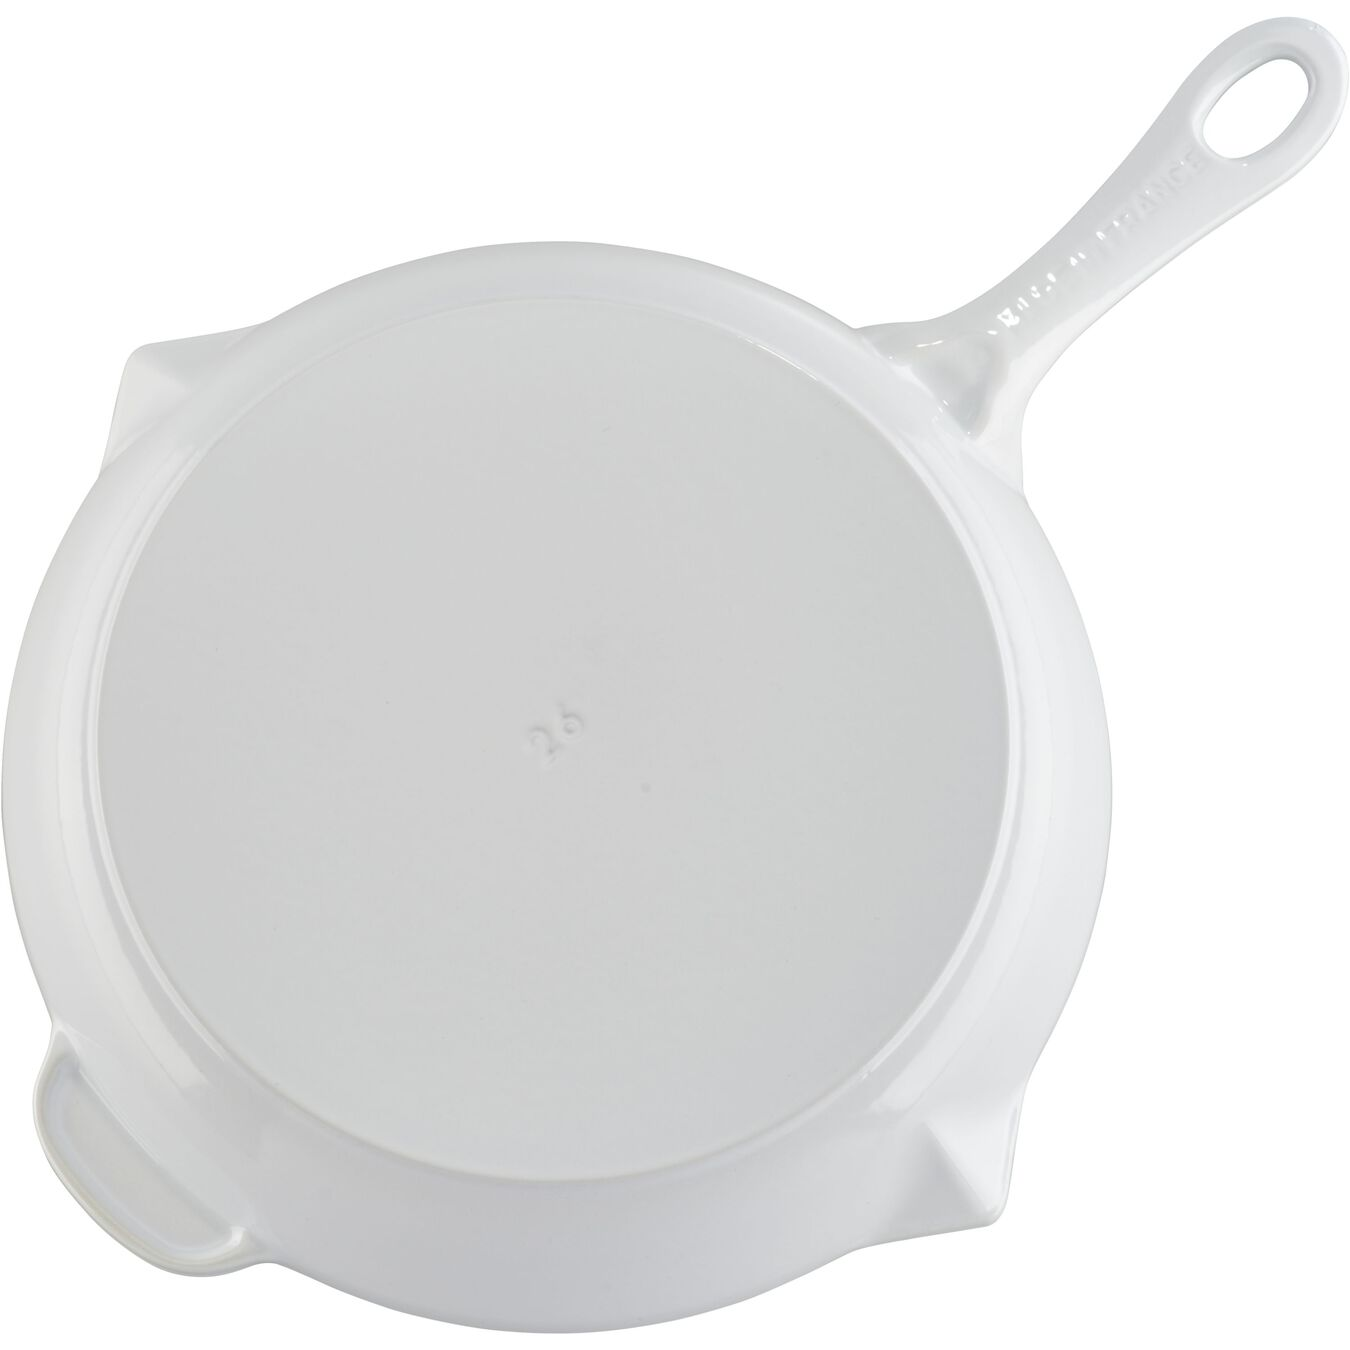 10-inch Fry Pan - White,,large 4